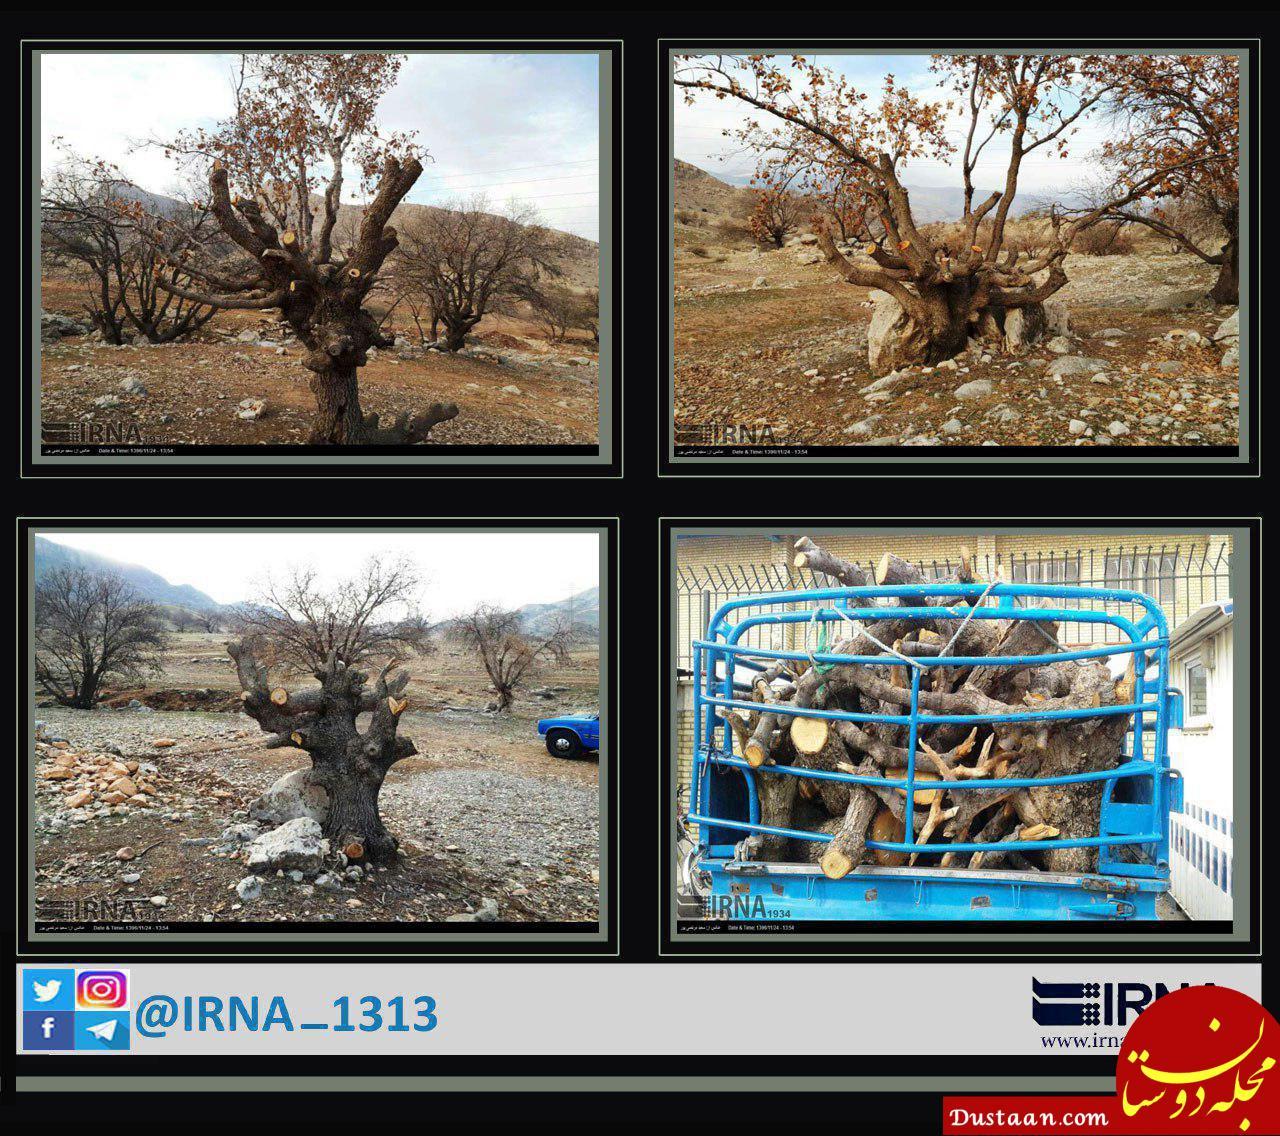 www.dustaan.com قطع درختان بلوط برای تهیه ذغال! +عکس